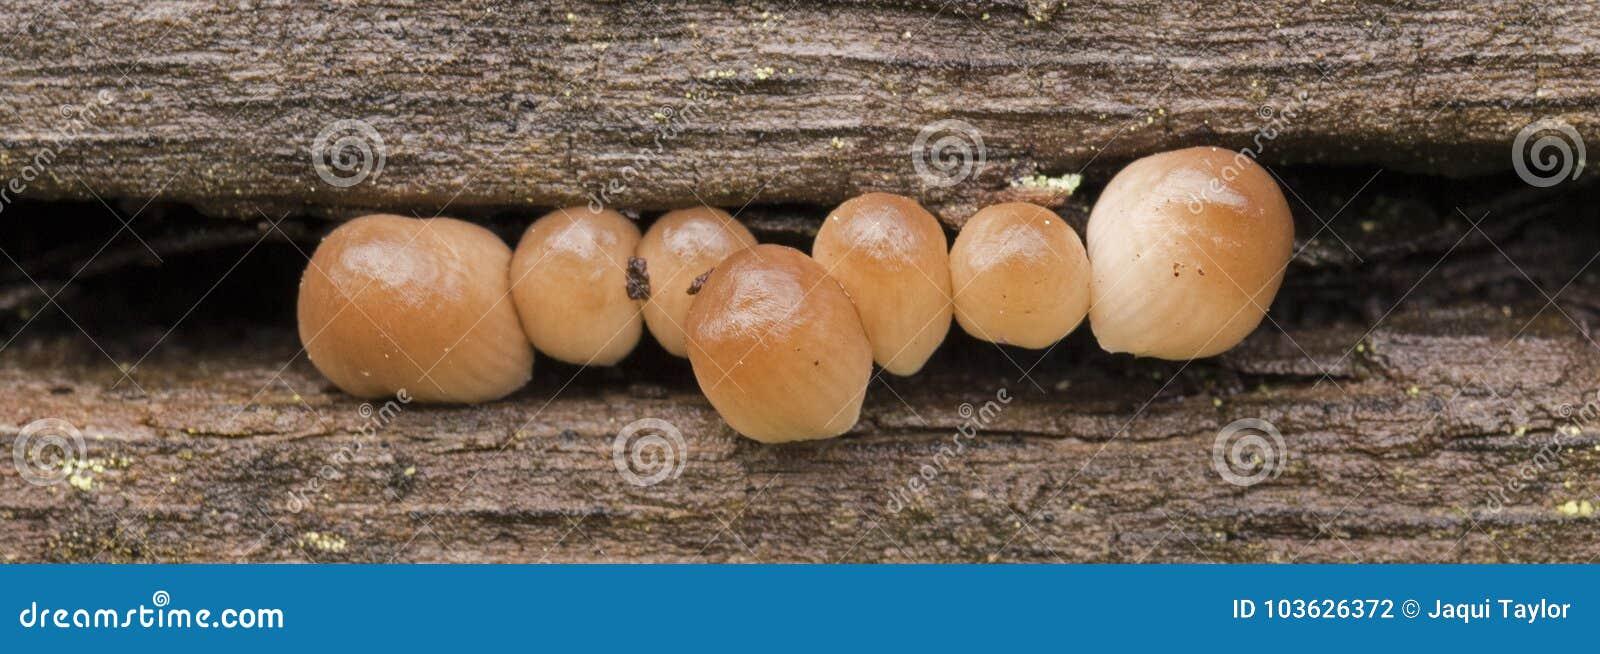 Seven tiny mushrooms on Southampton Common